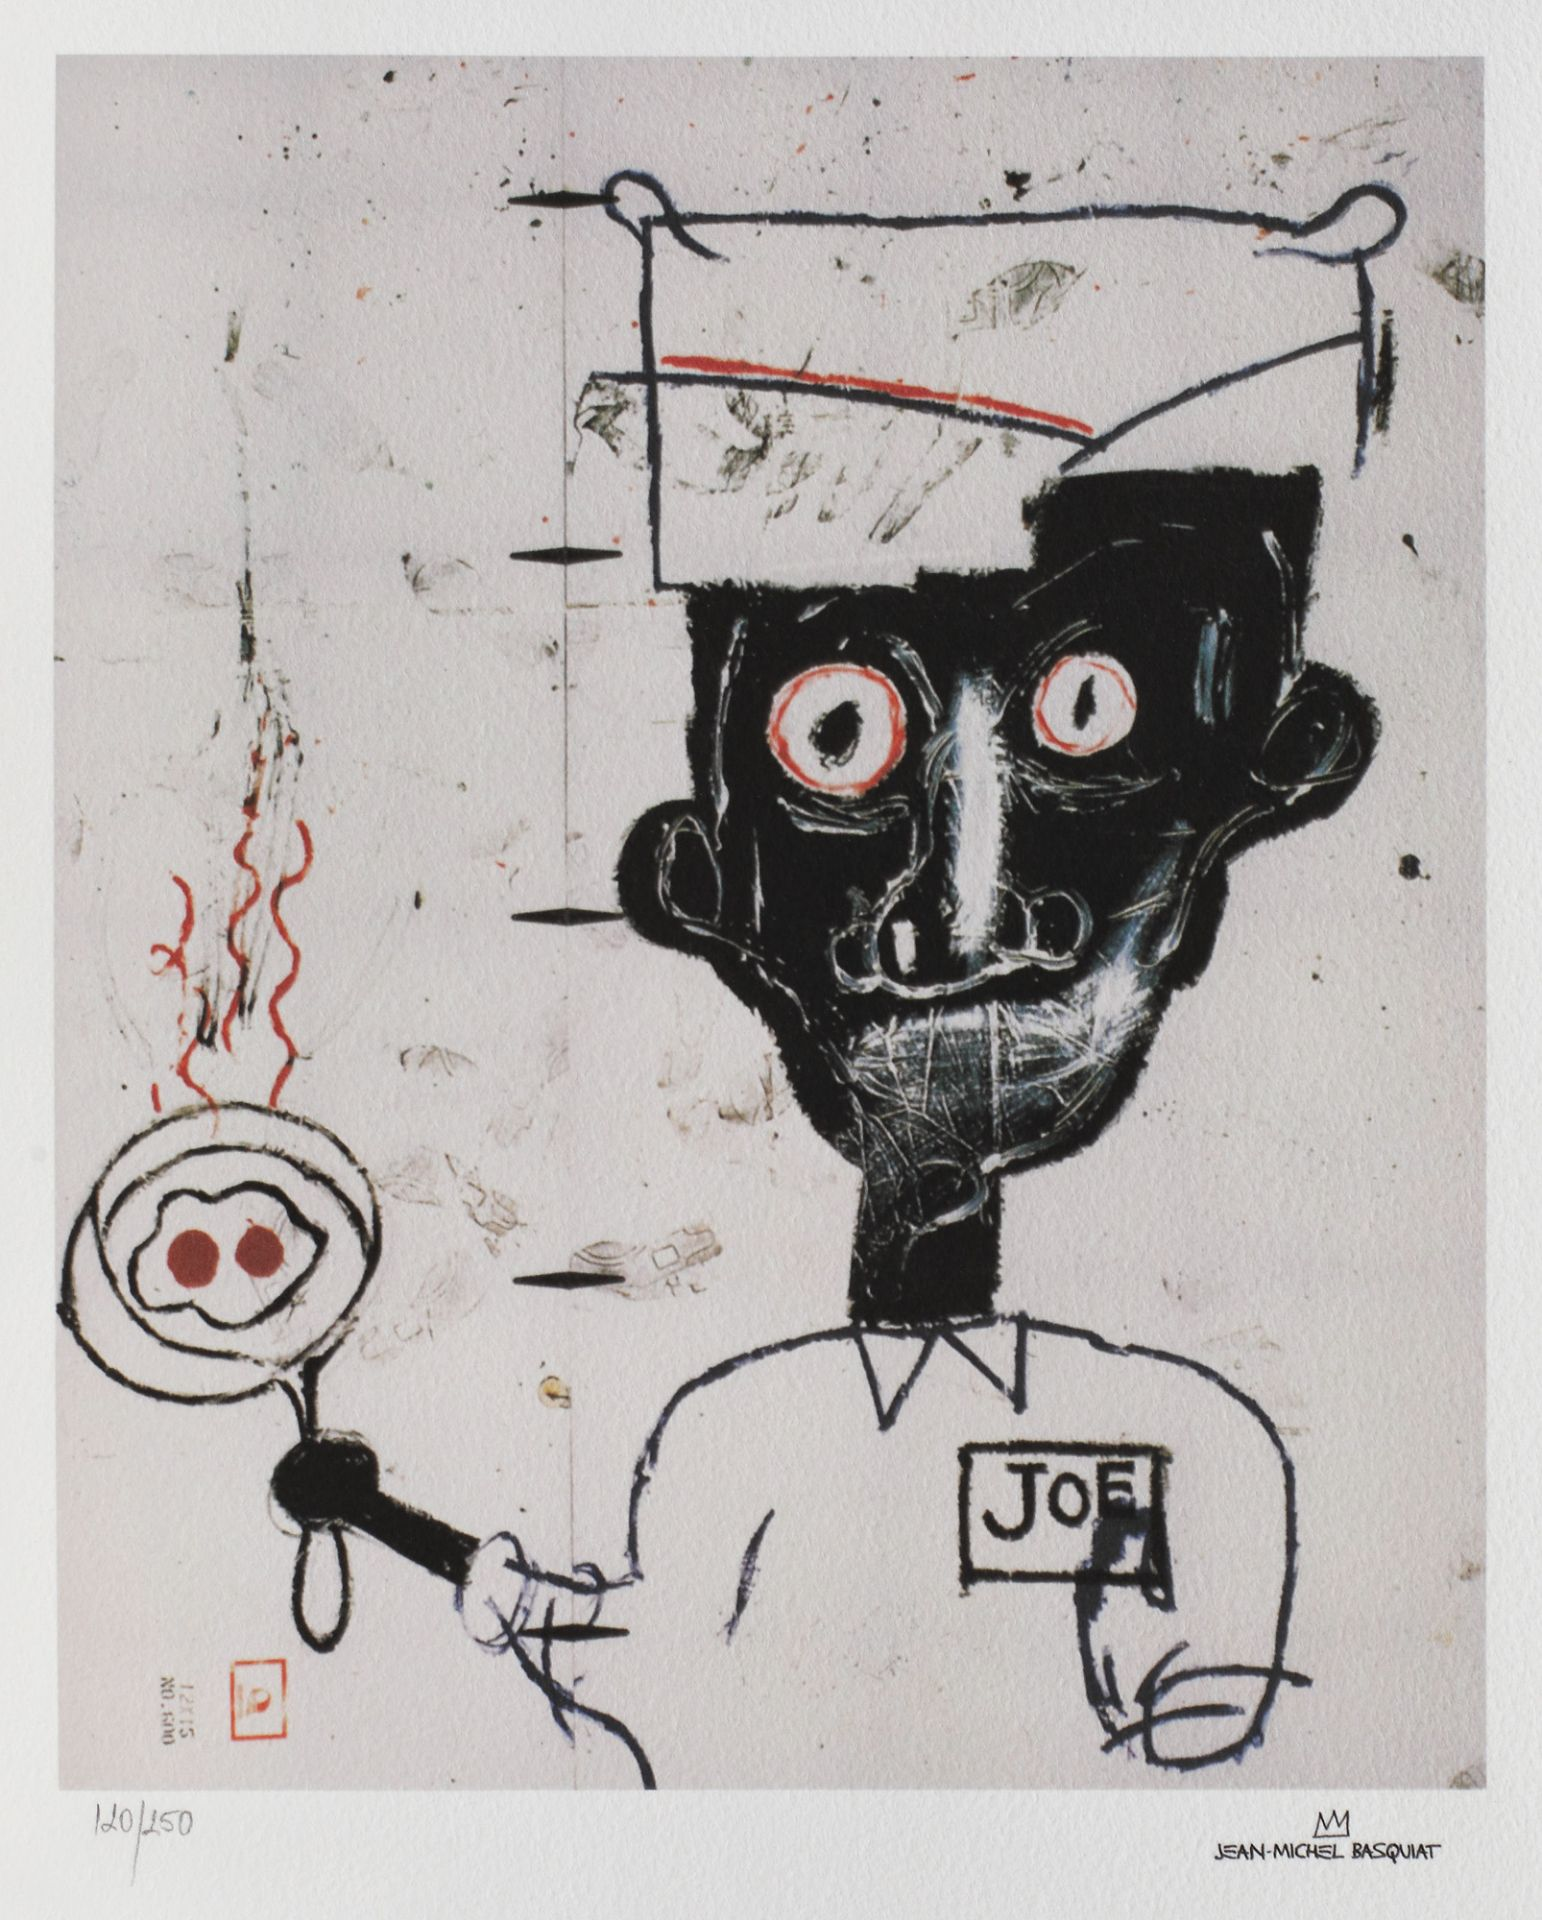 Jean-Michel Basquiat, Eyes and EggsJean-Michel Basquiat, Eyes and Eggs, chromolithography, 25,5